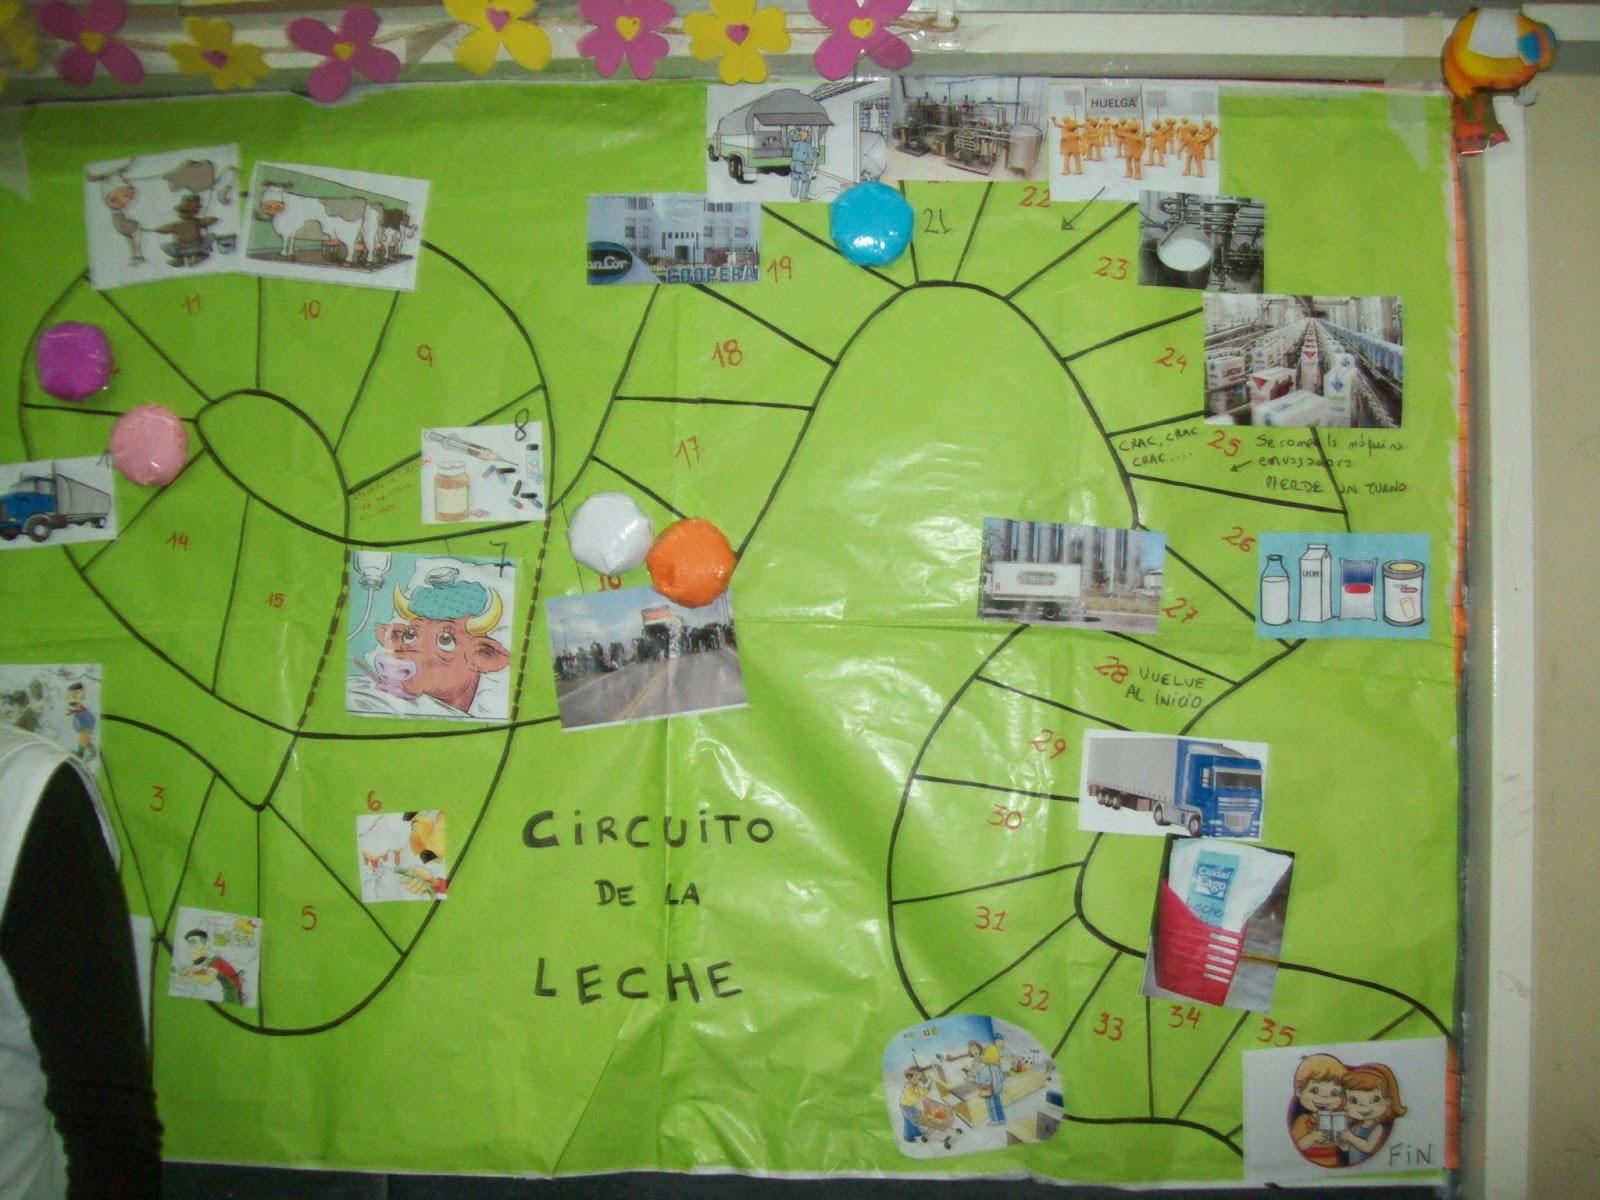 Circuito De La Leche : República de méxico